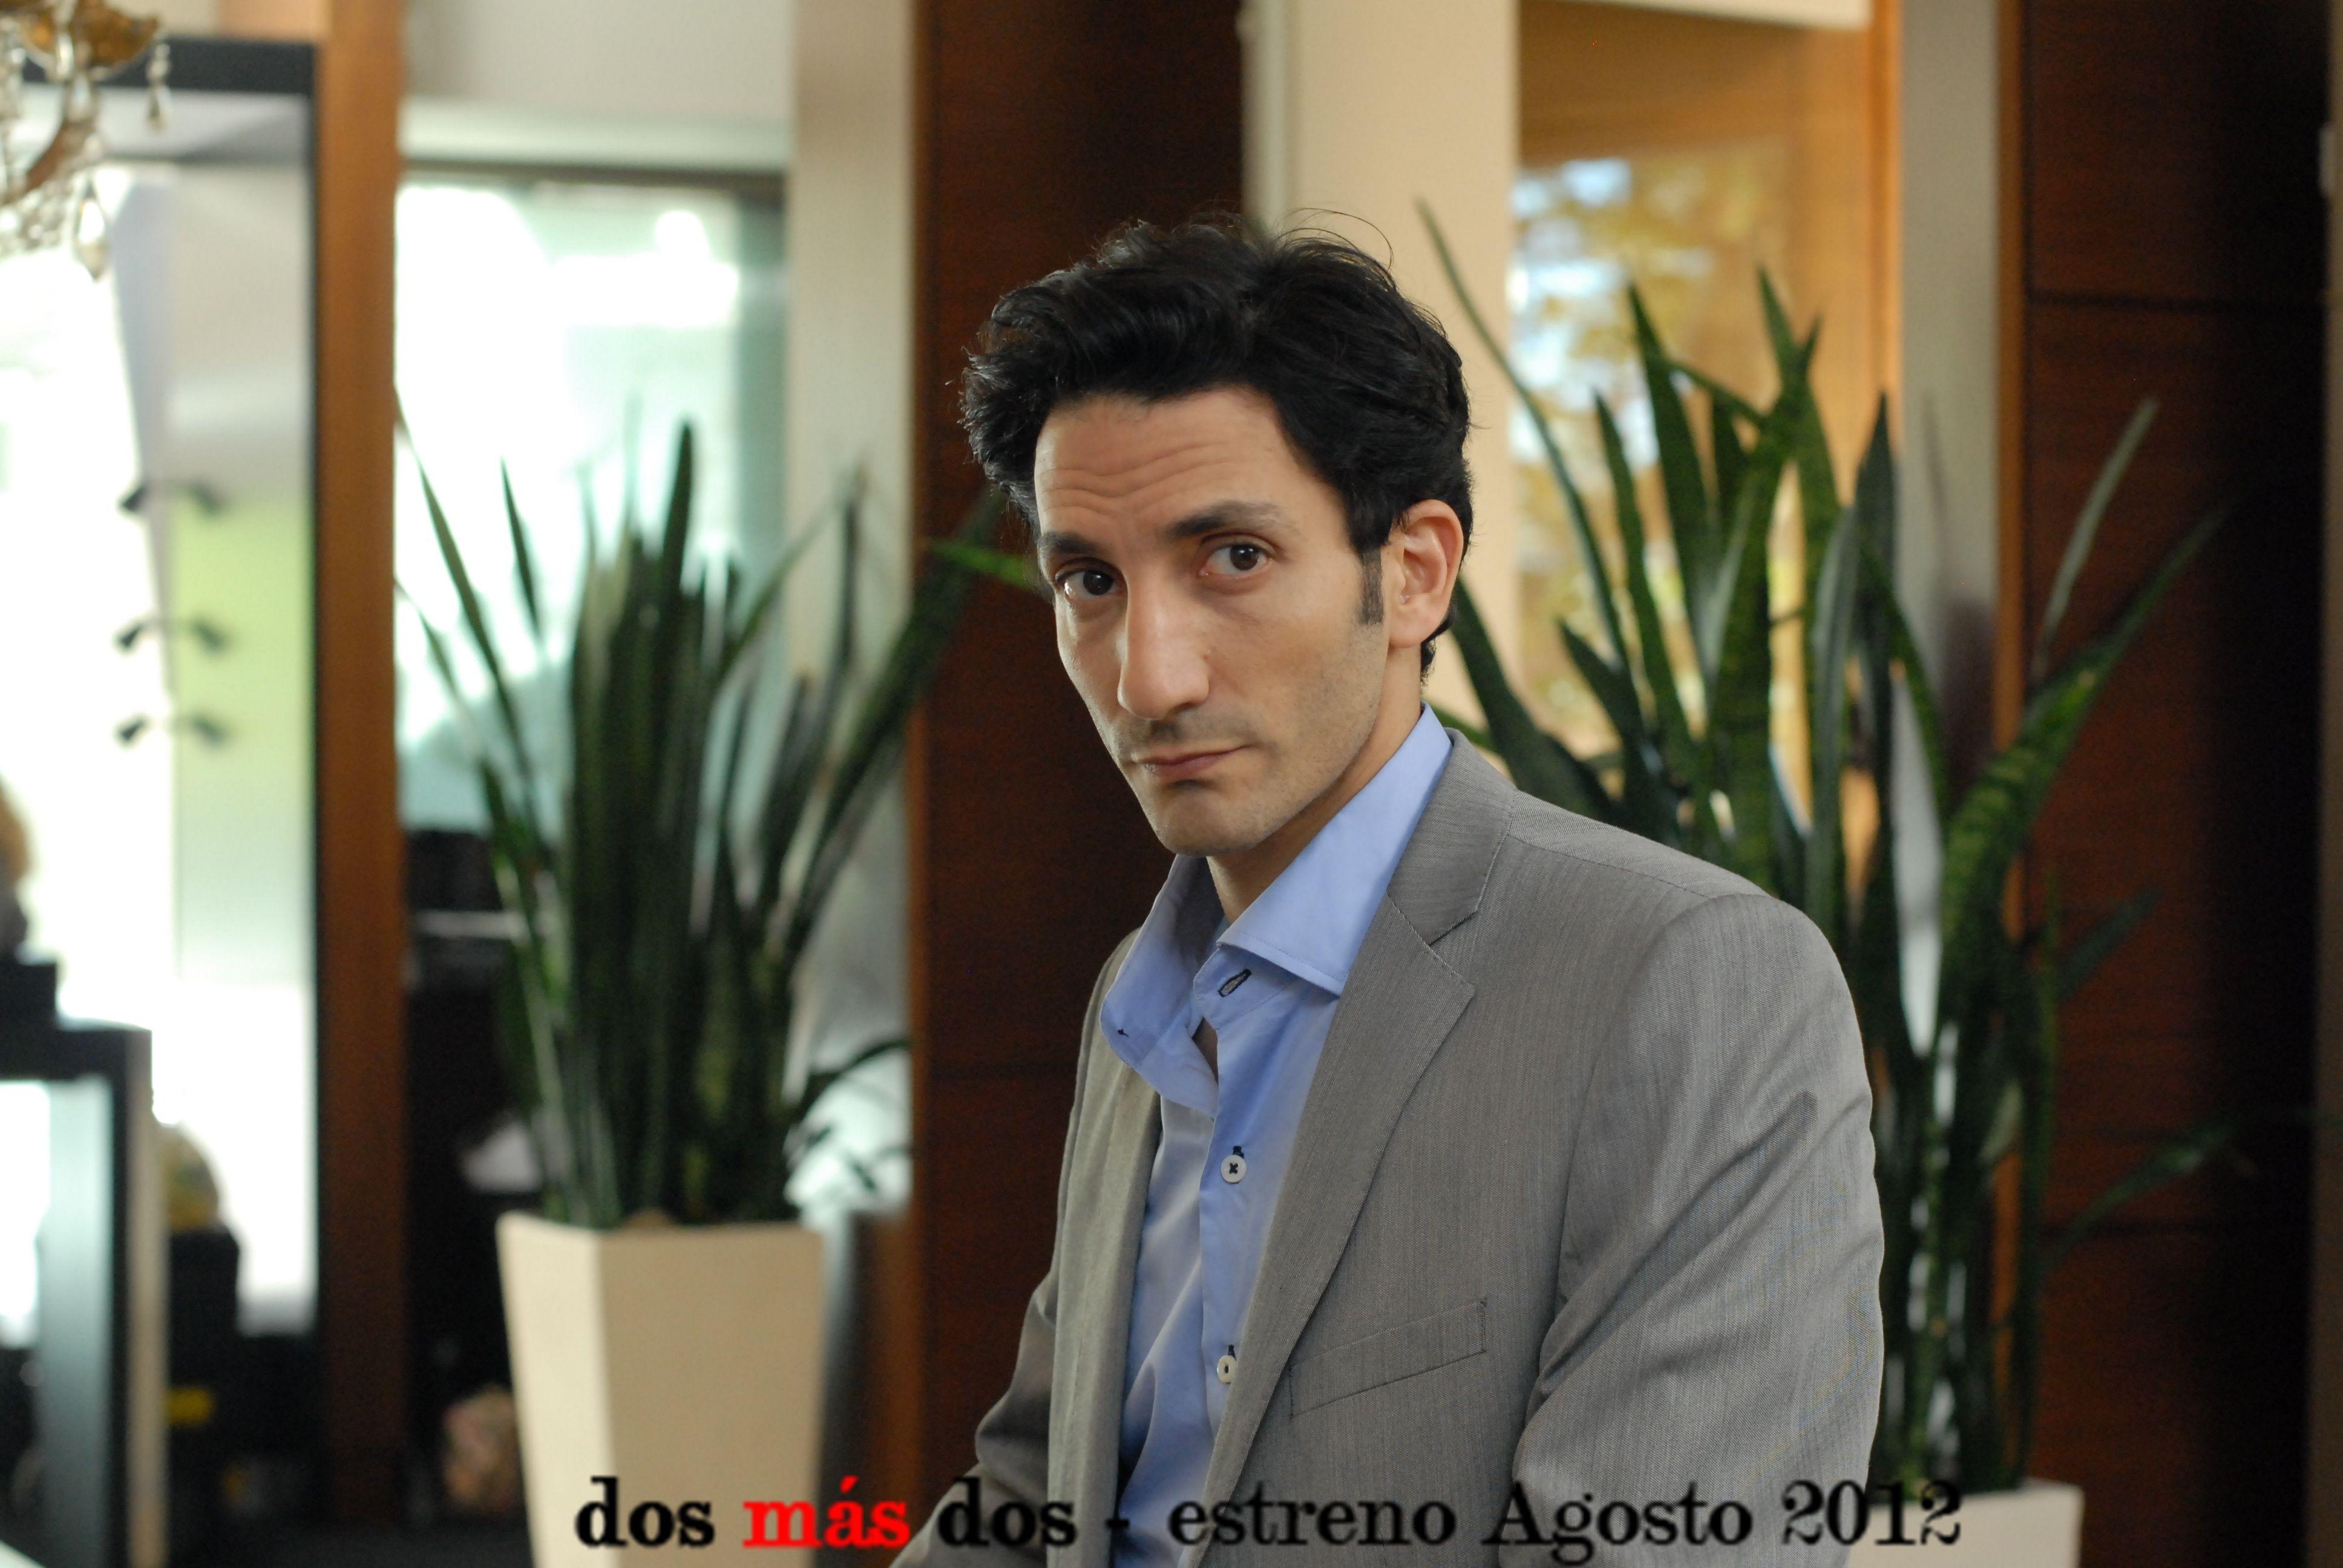 Juan Minujín - Dos más Dos - La comedia del 2012.